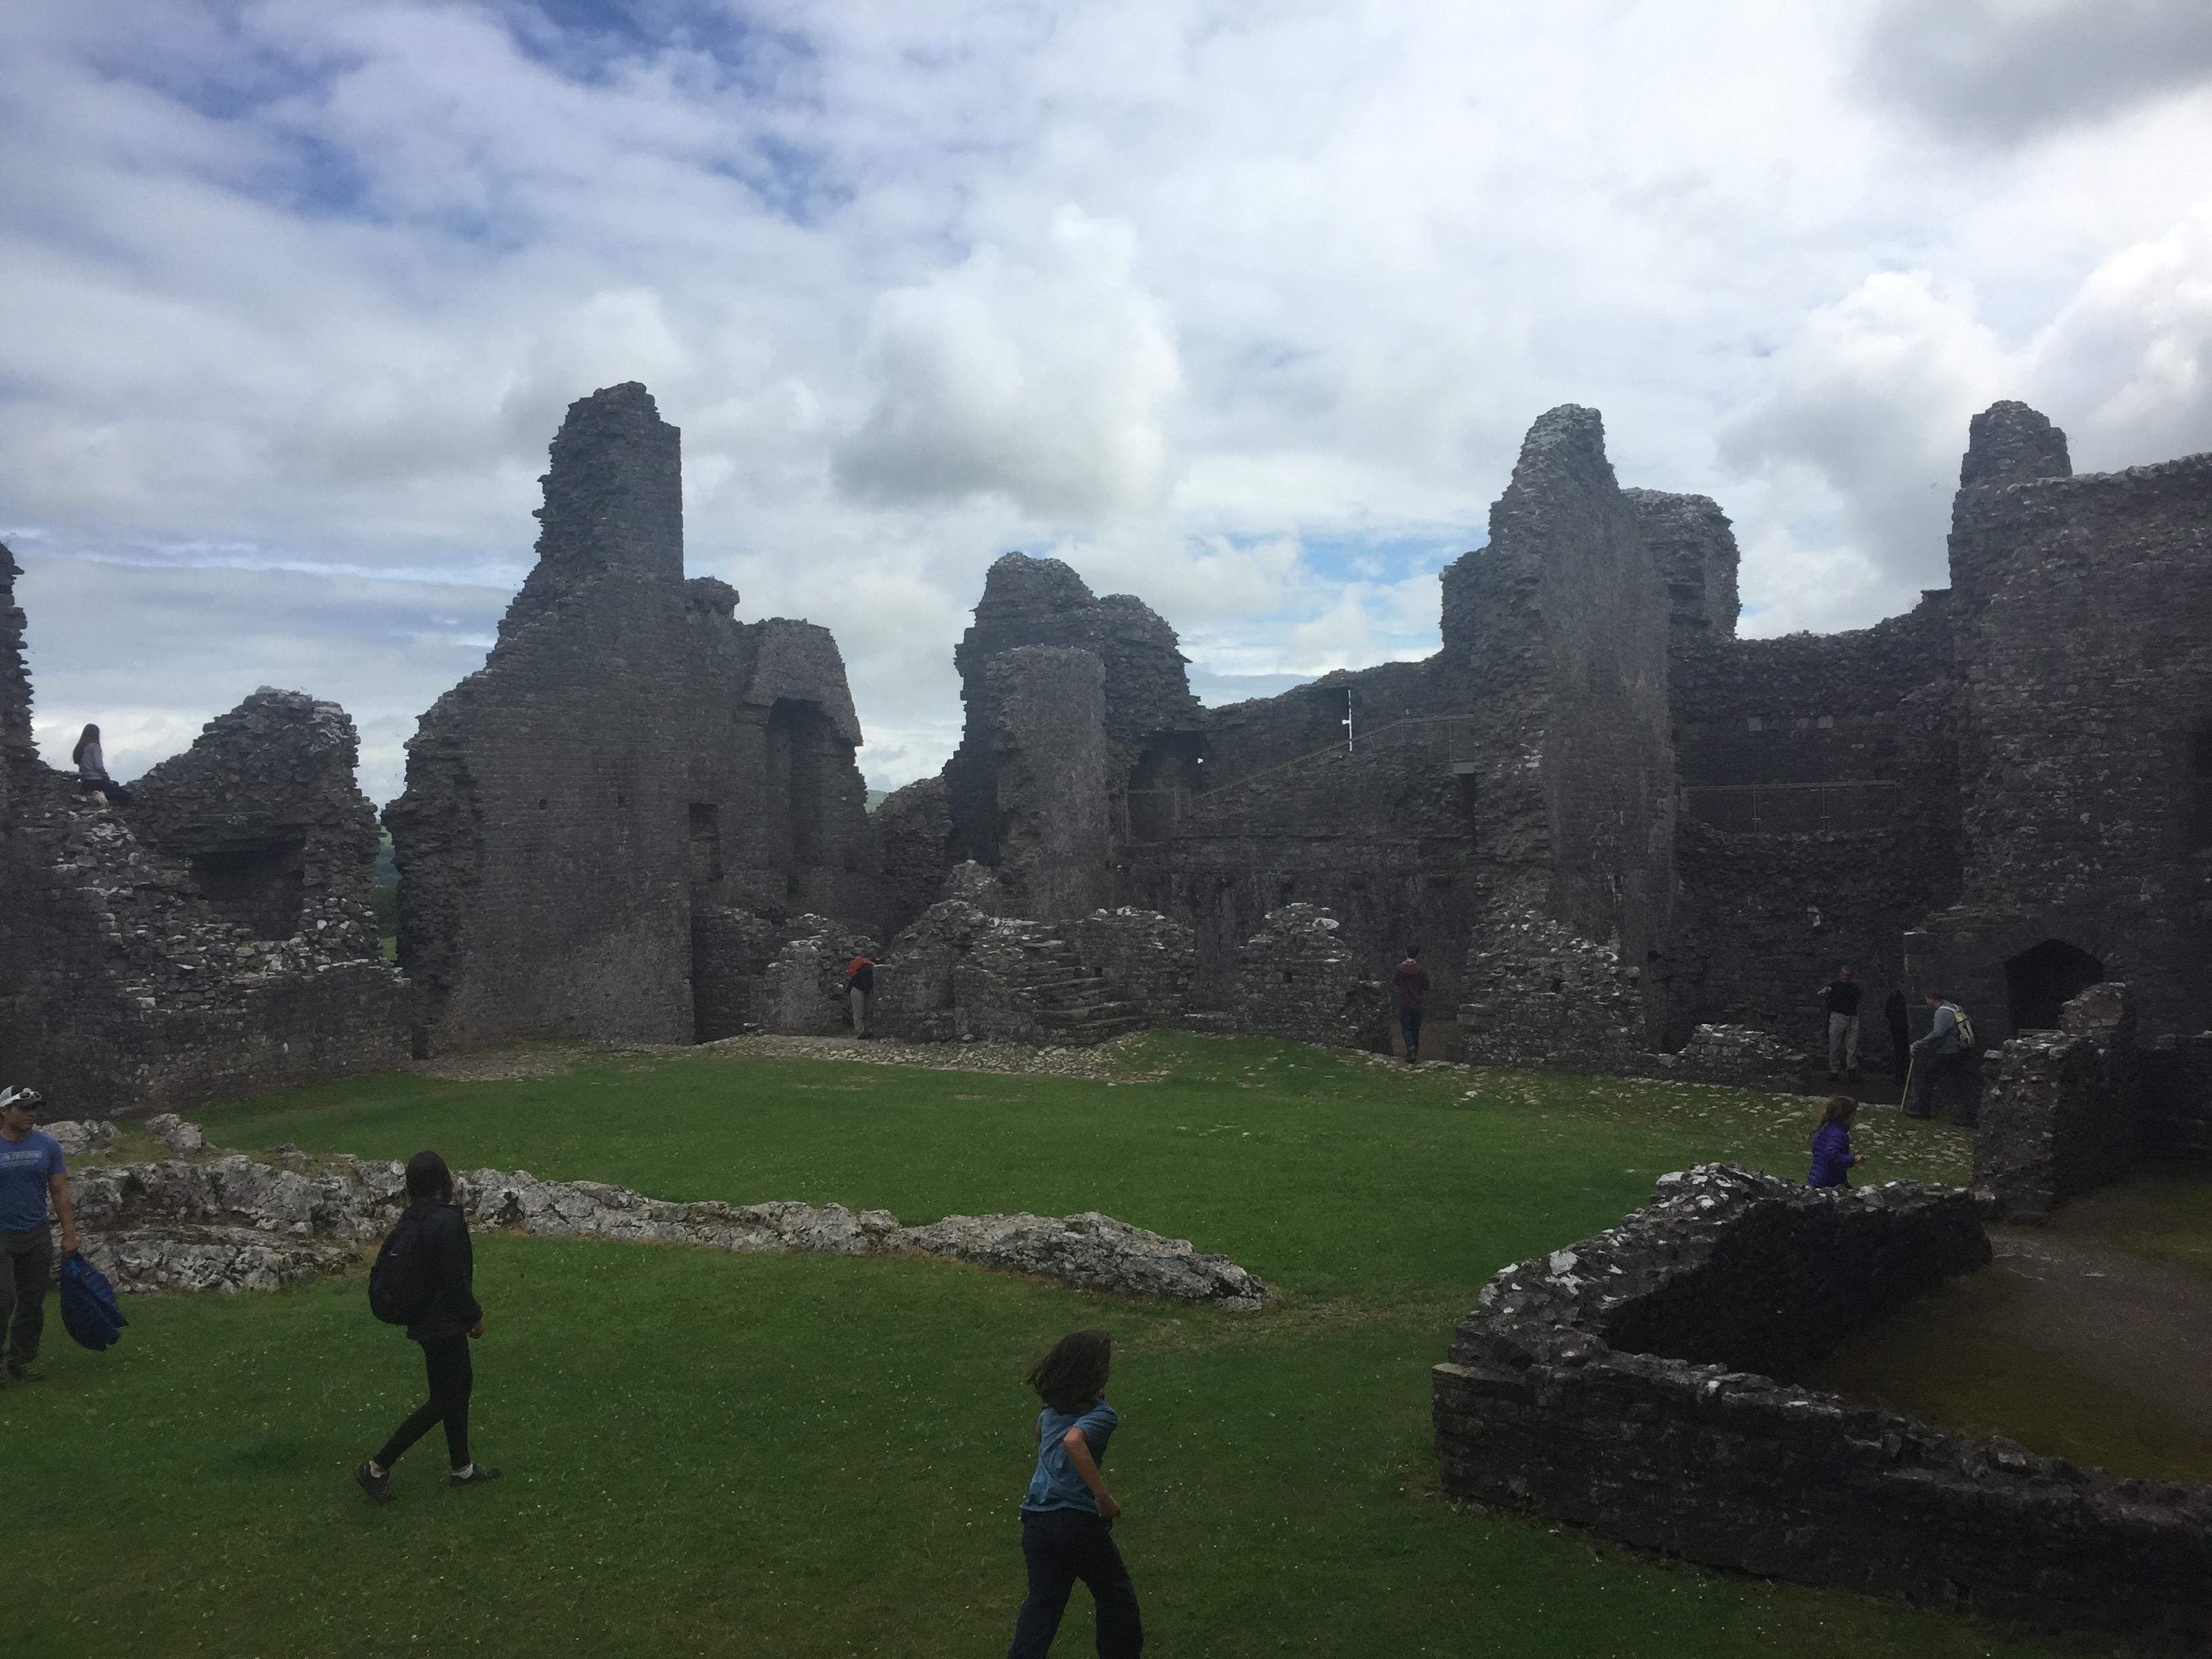 nomadswithapurpose, traveling with kids, european travel, best castles in europe, castles in europe, carreg cennen castle, welsh castles, best castles in uk